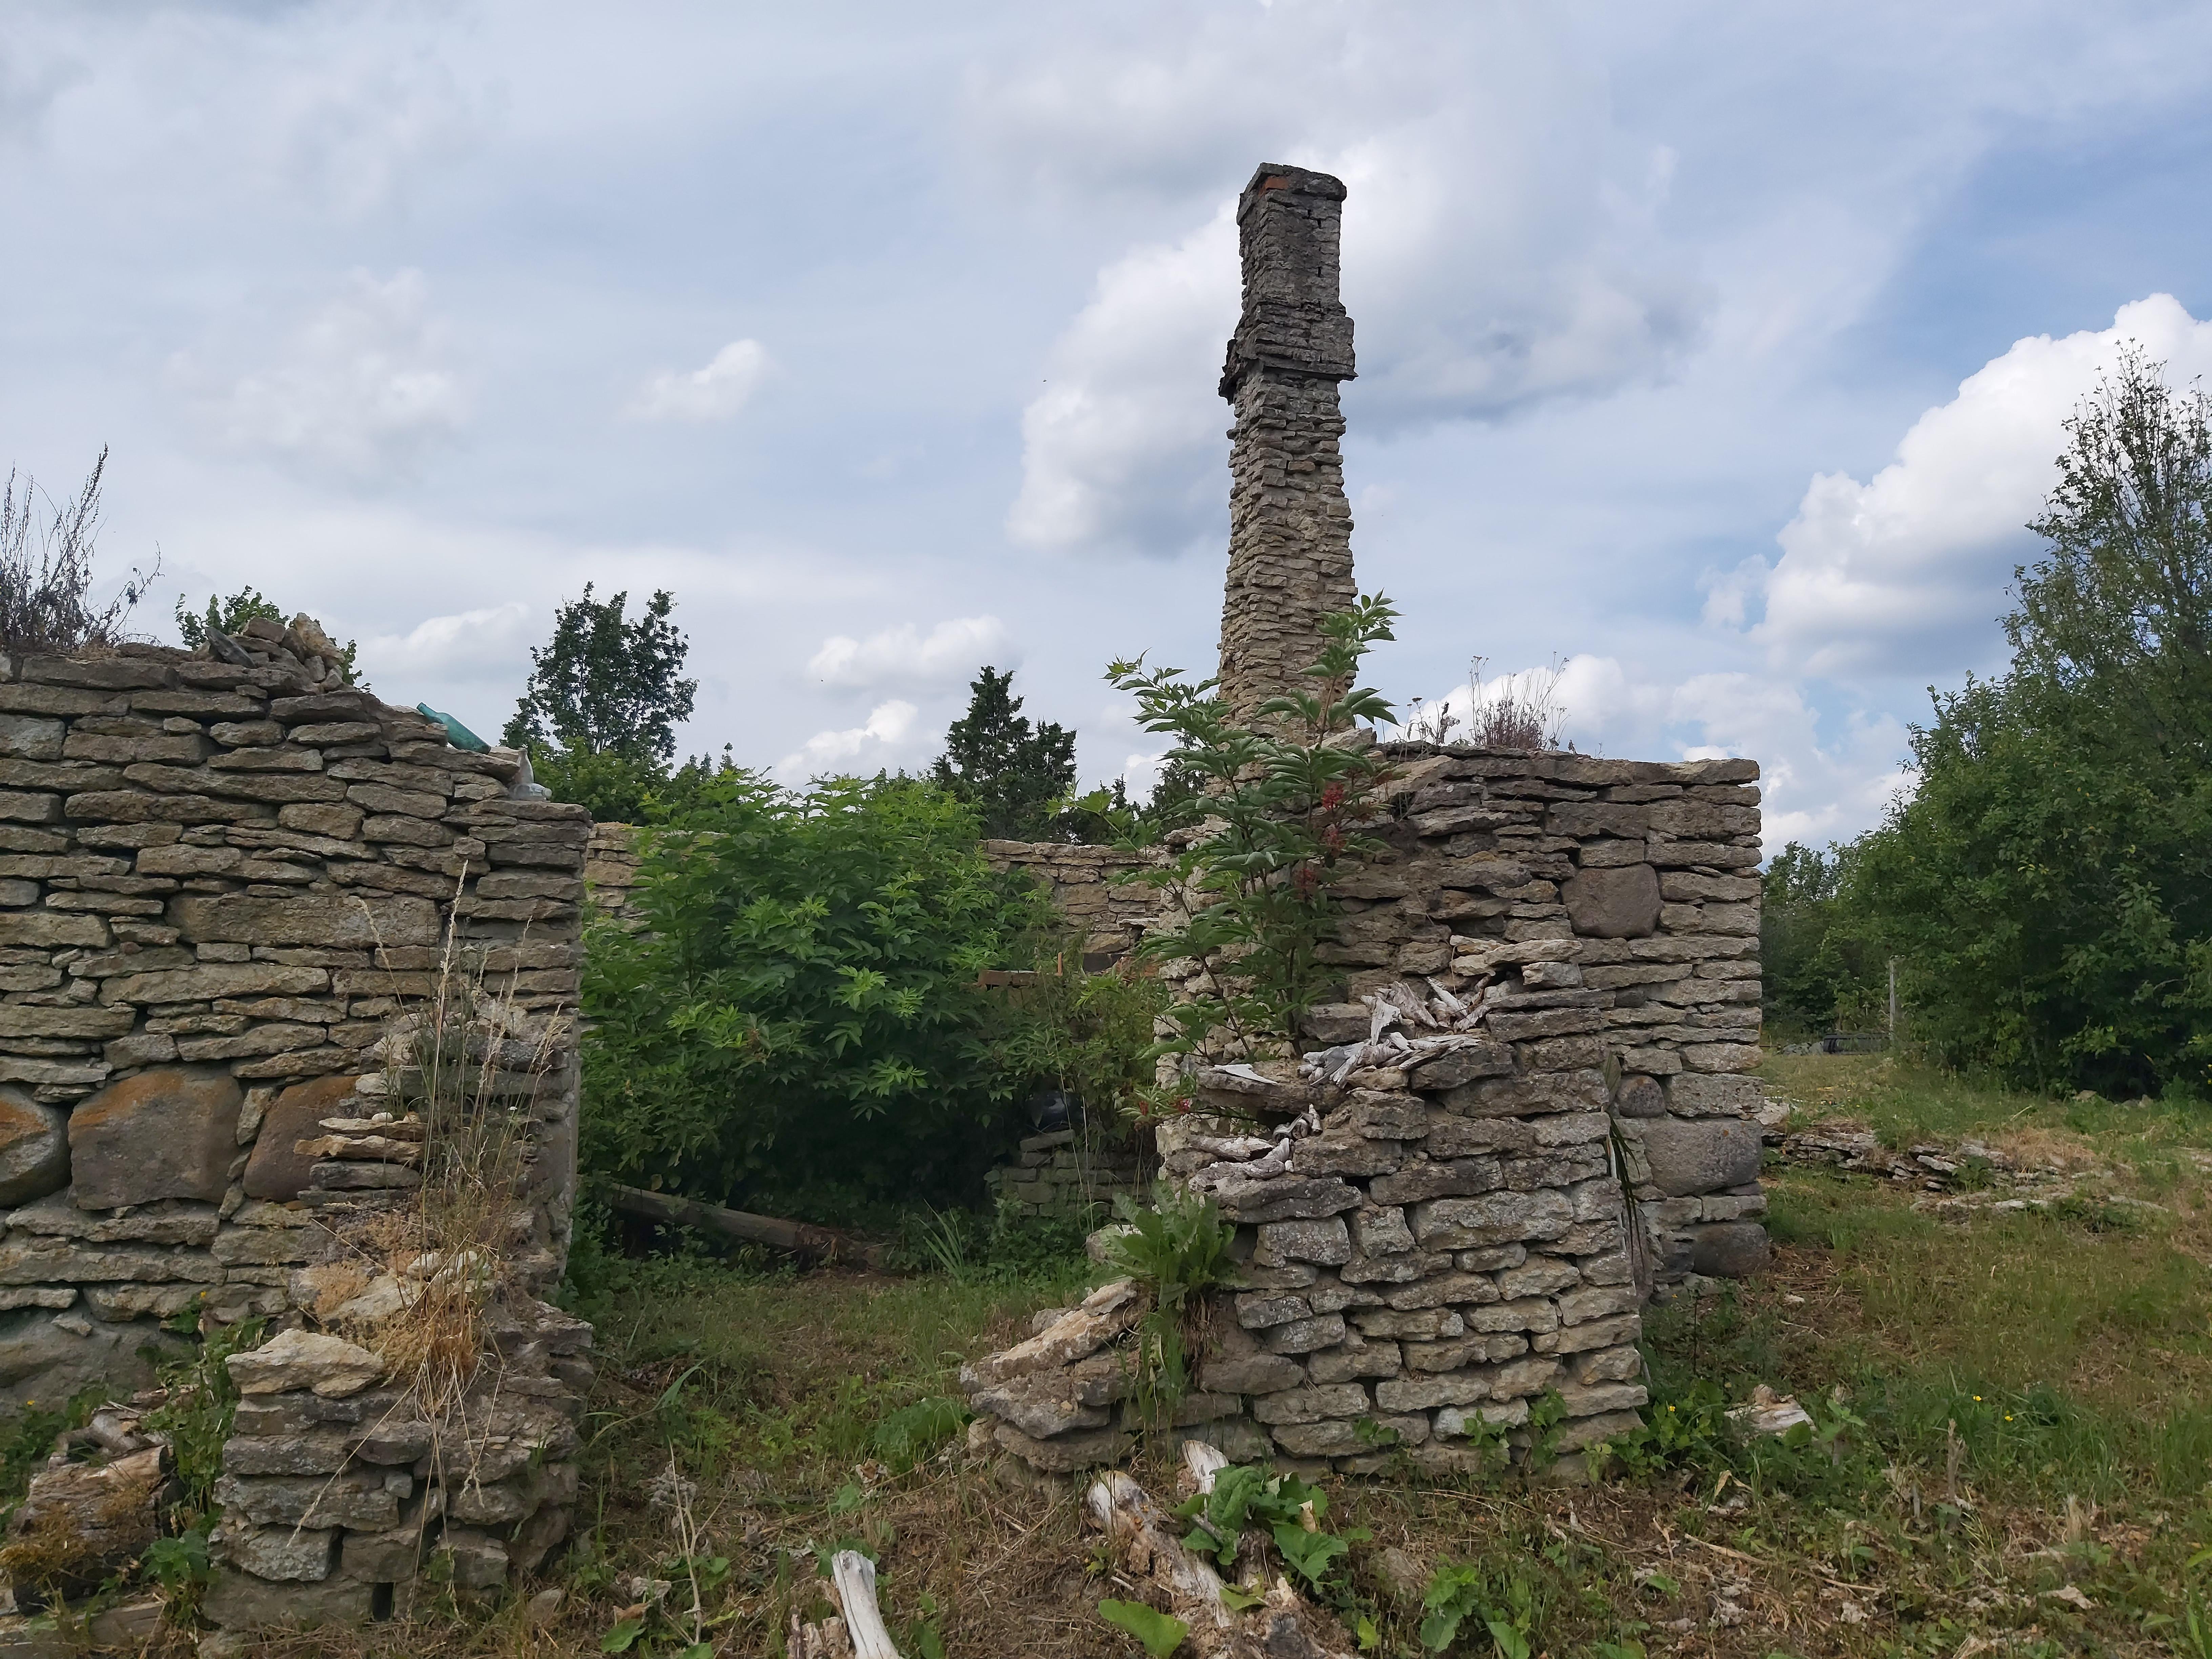 Arhitekti pilguga: varemete uus kasutus